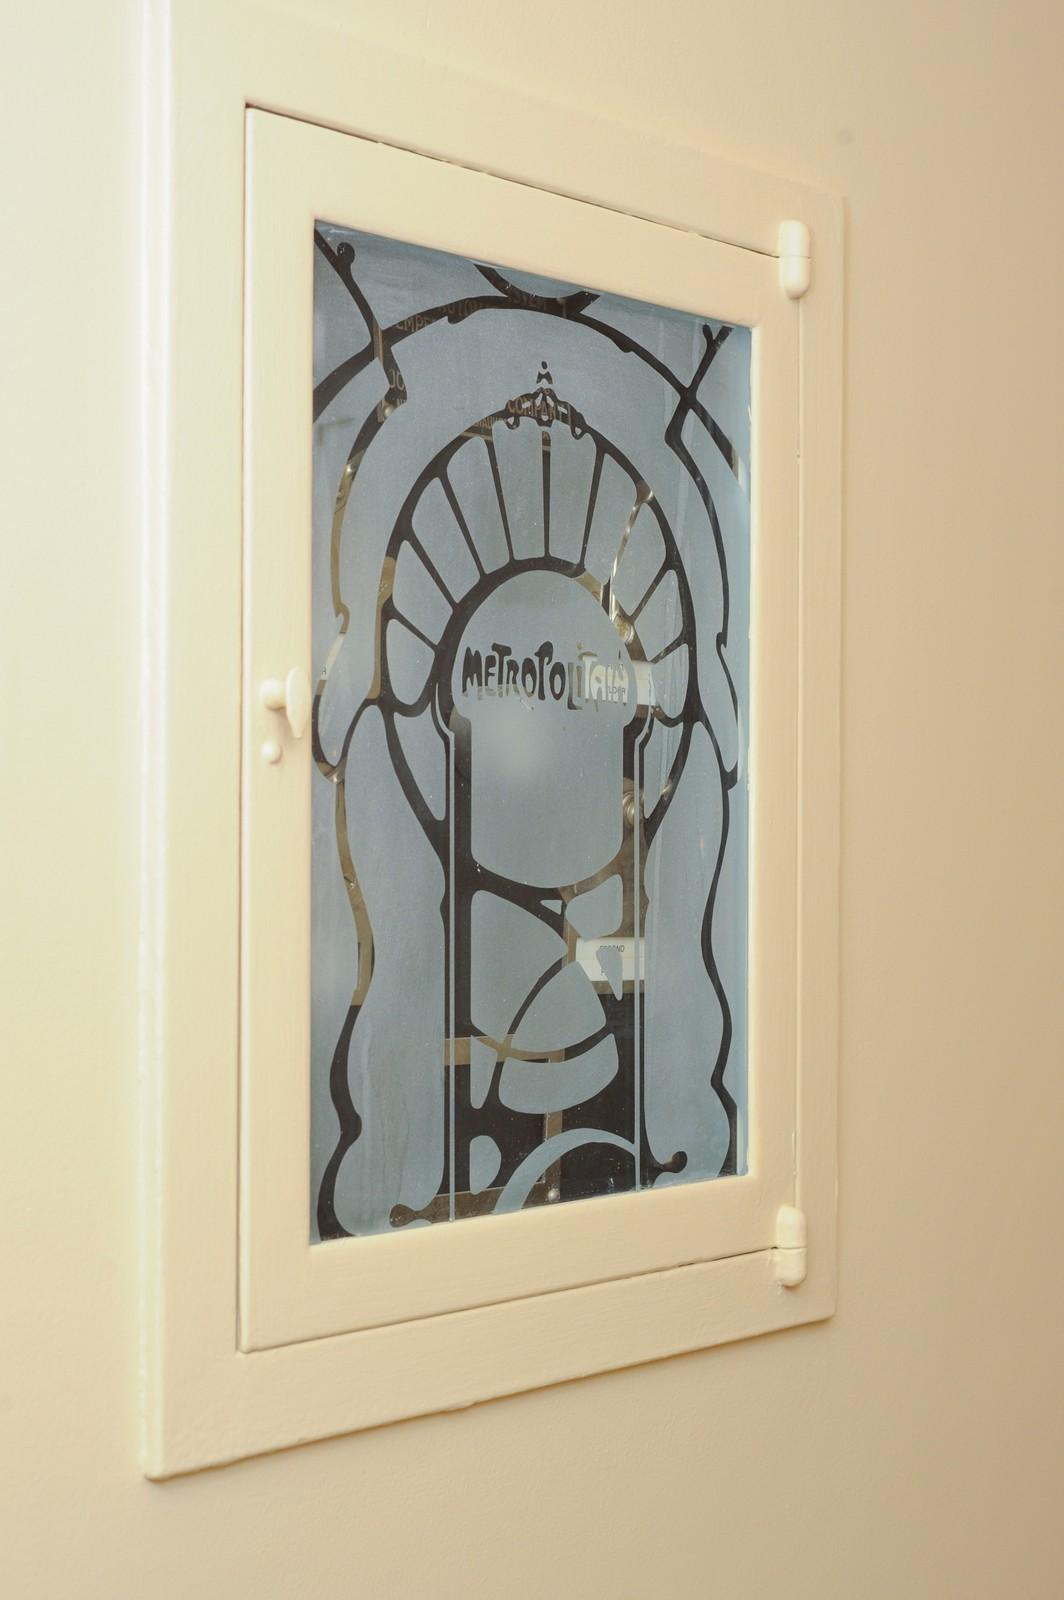 Real Estate Photography - 443 Sheridan Rd, Glencoe, IL, 60022 - Original Thermostat